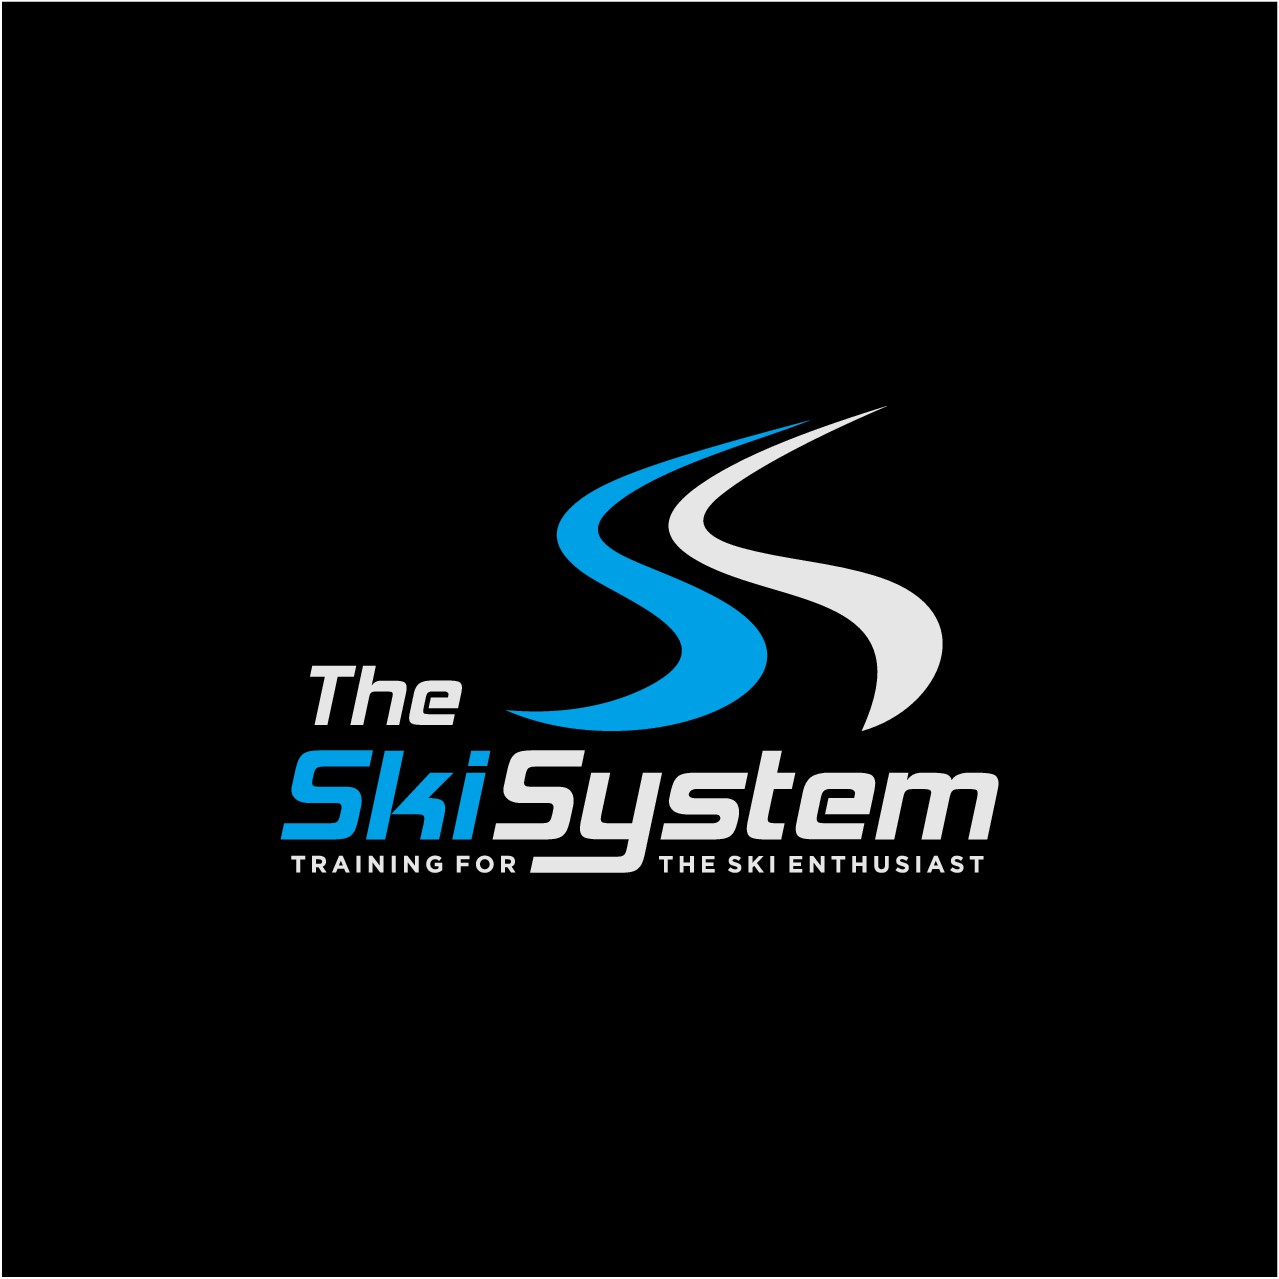 The Ski System